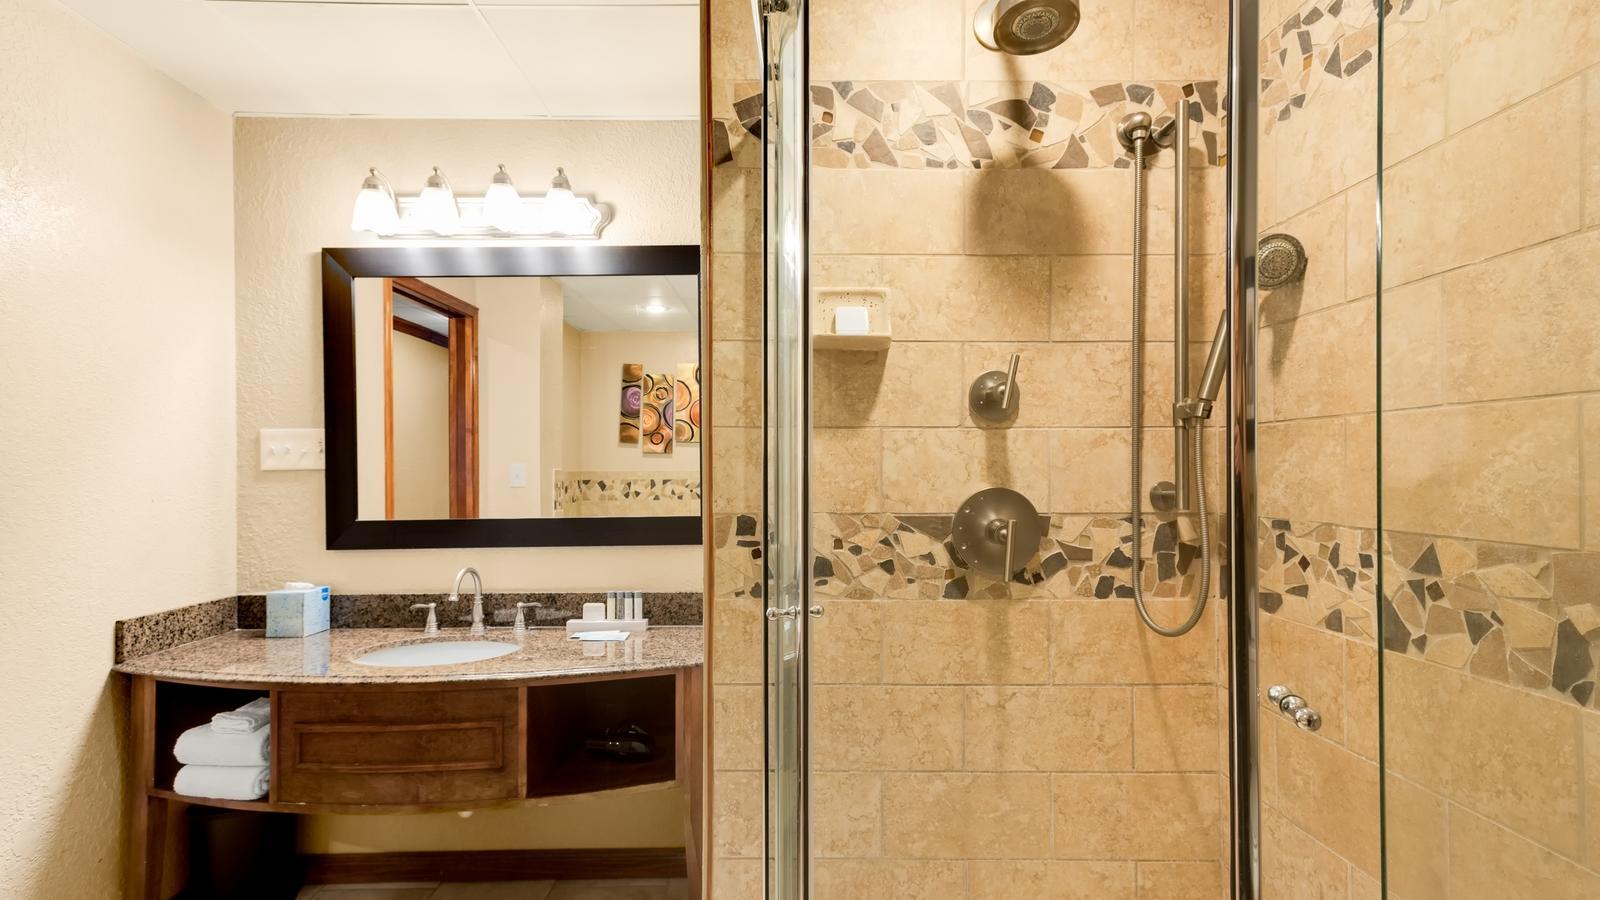 Walk in shower and bathroom vanity